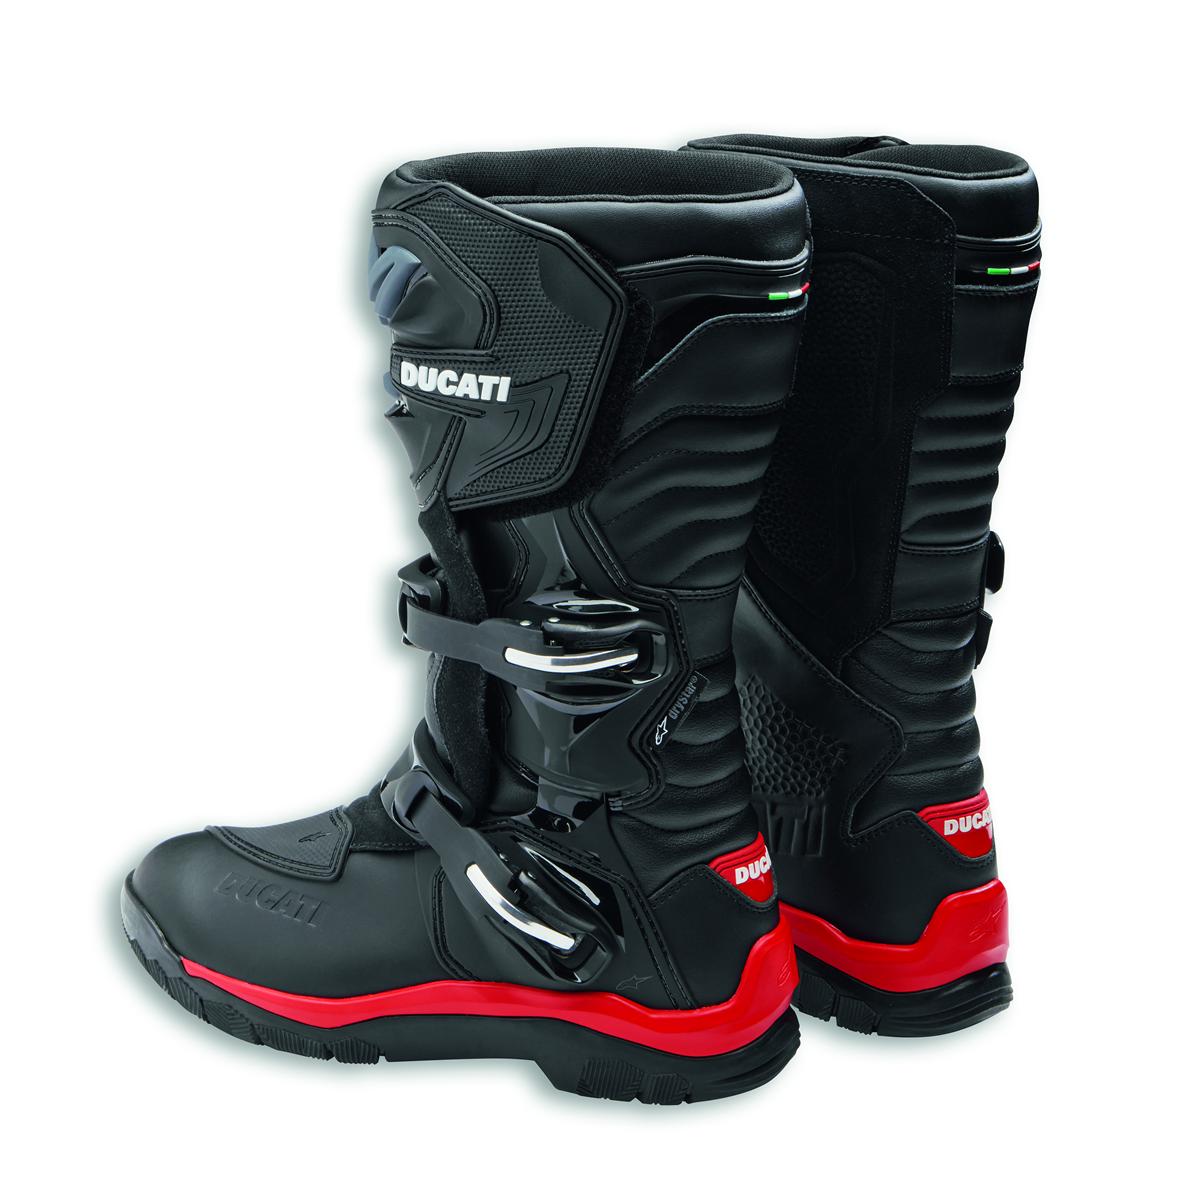 Atacama WP C1 - Touring-Adventure Boots